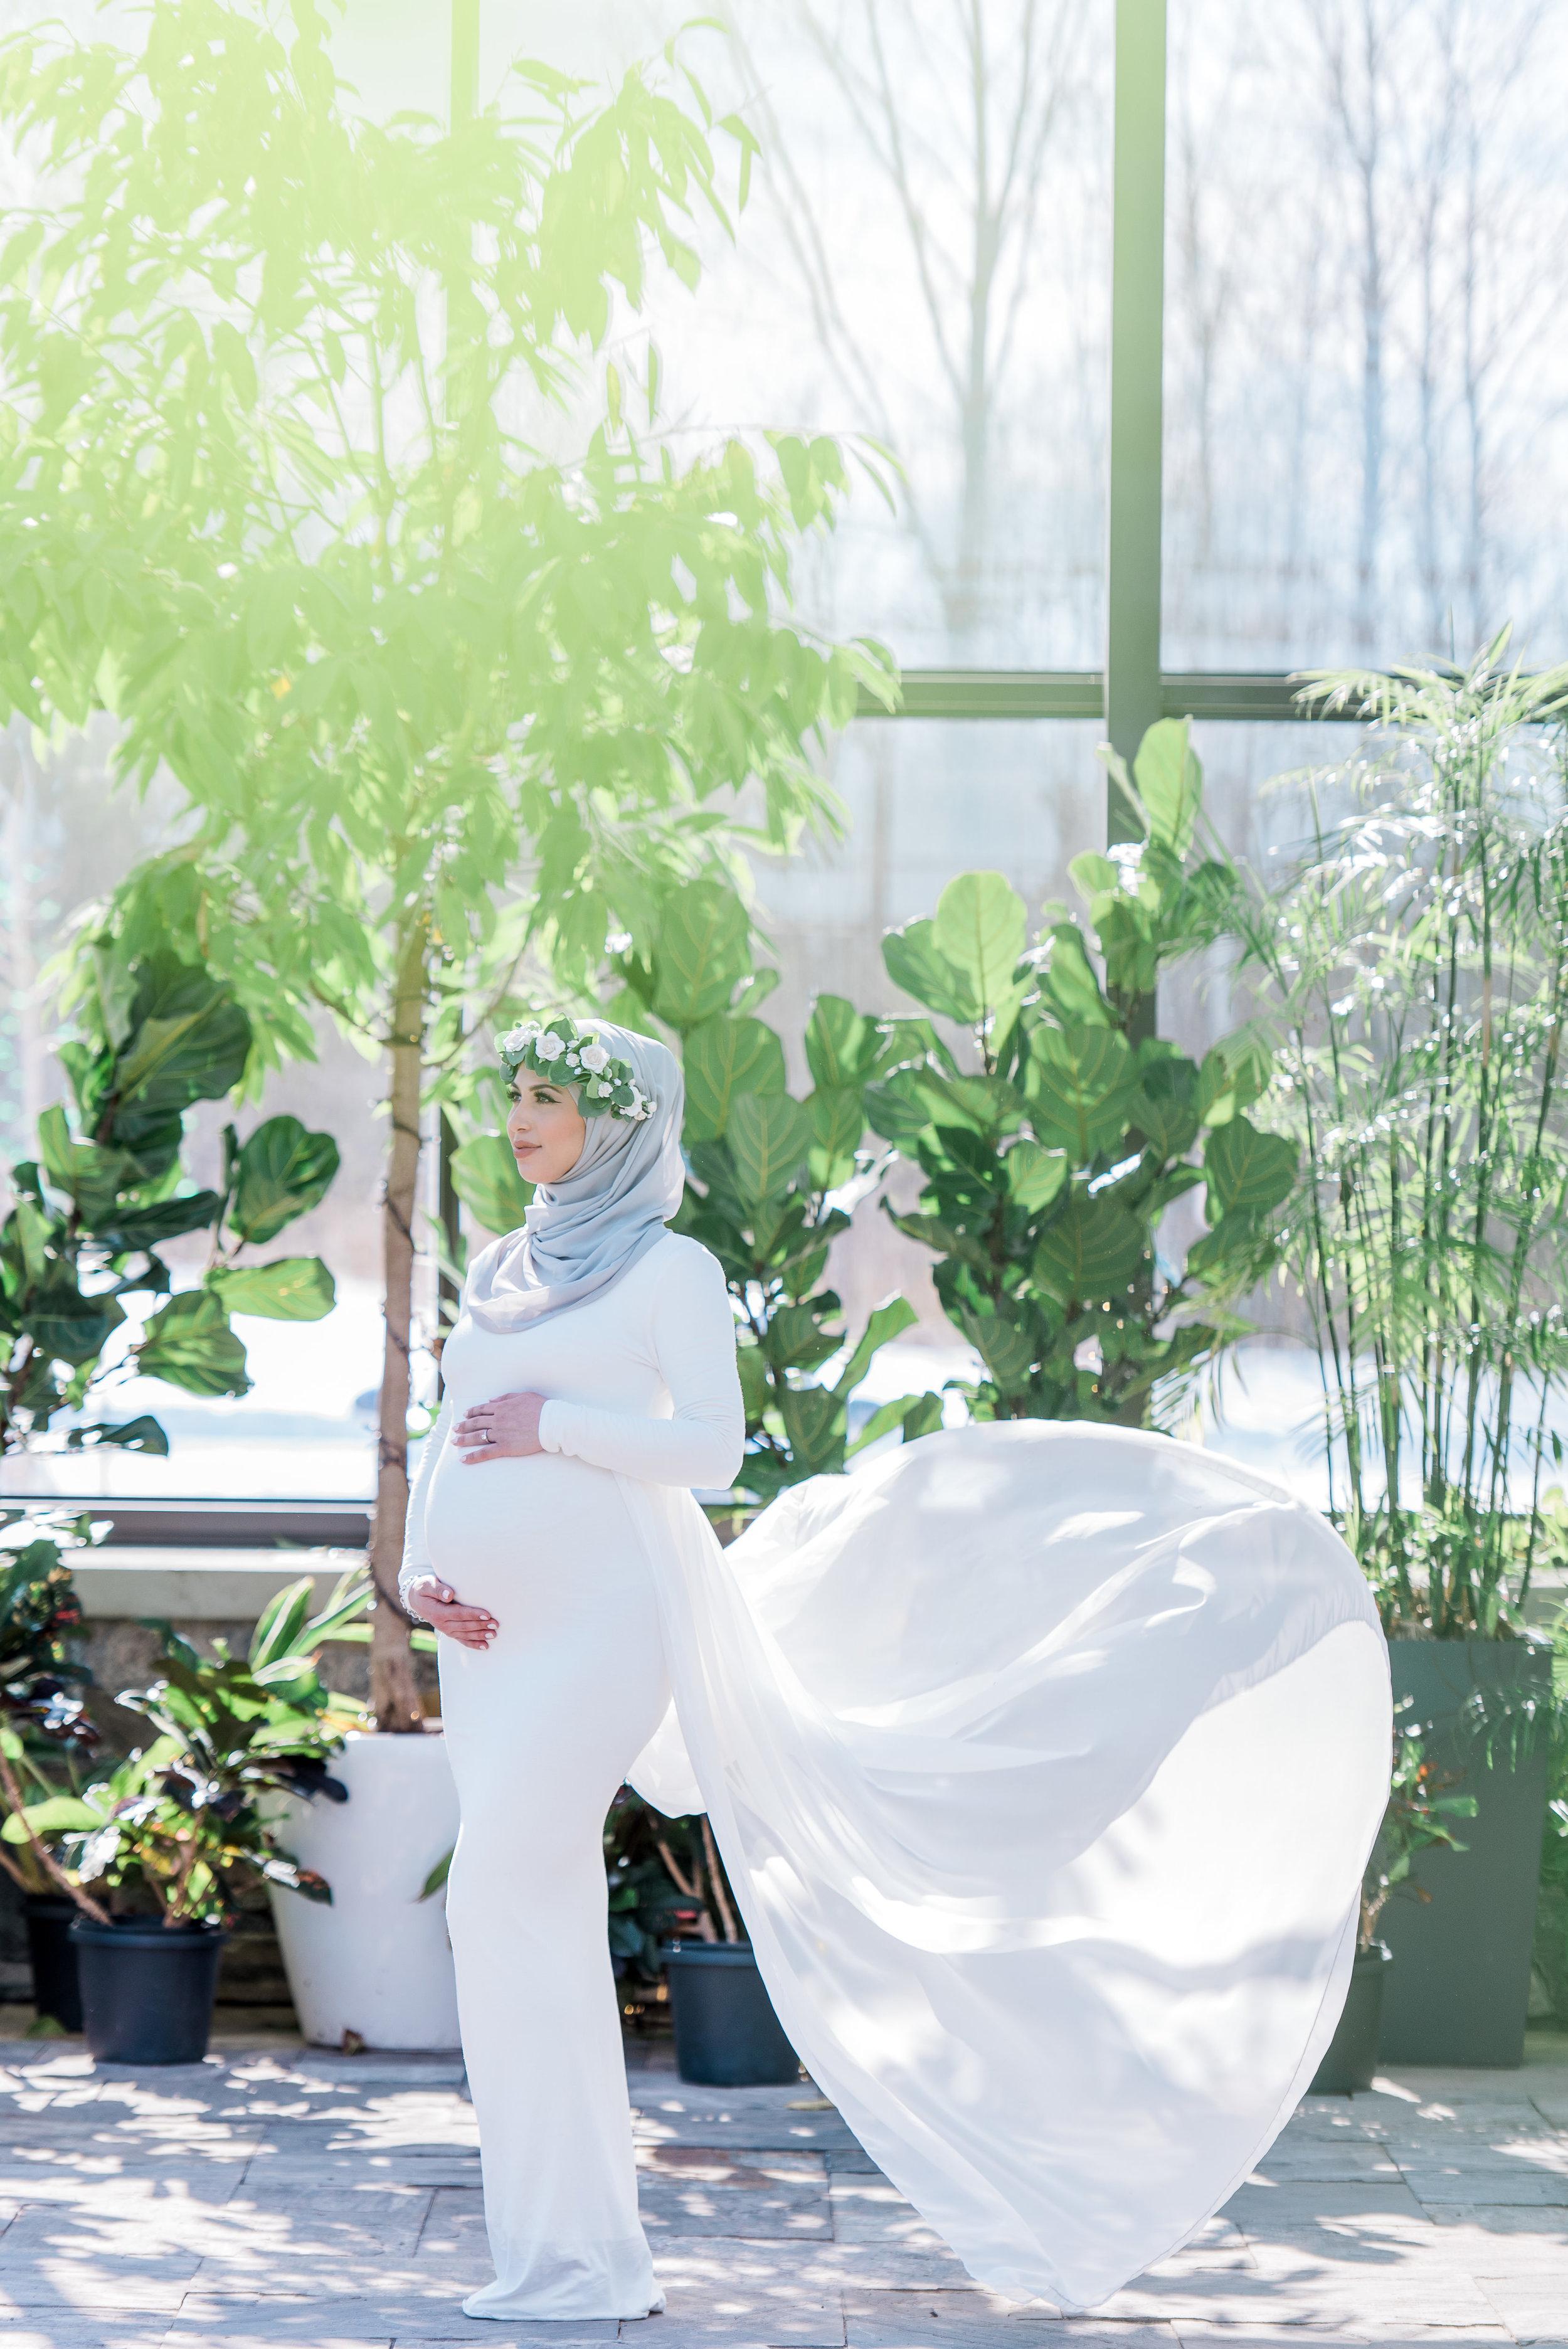 Hanan Tehaili White Maternity Gown_Maternity Photoshoot.jpg